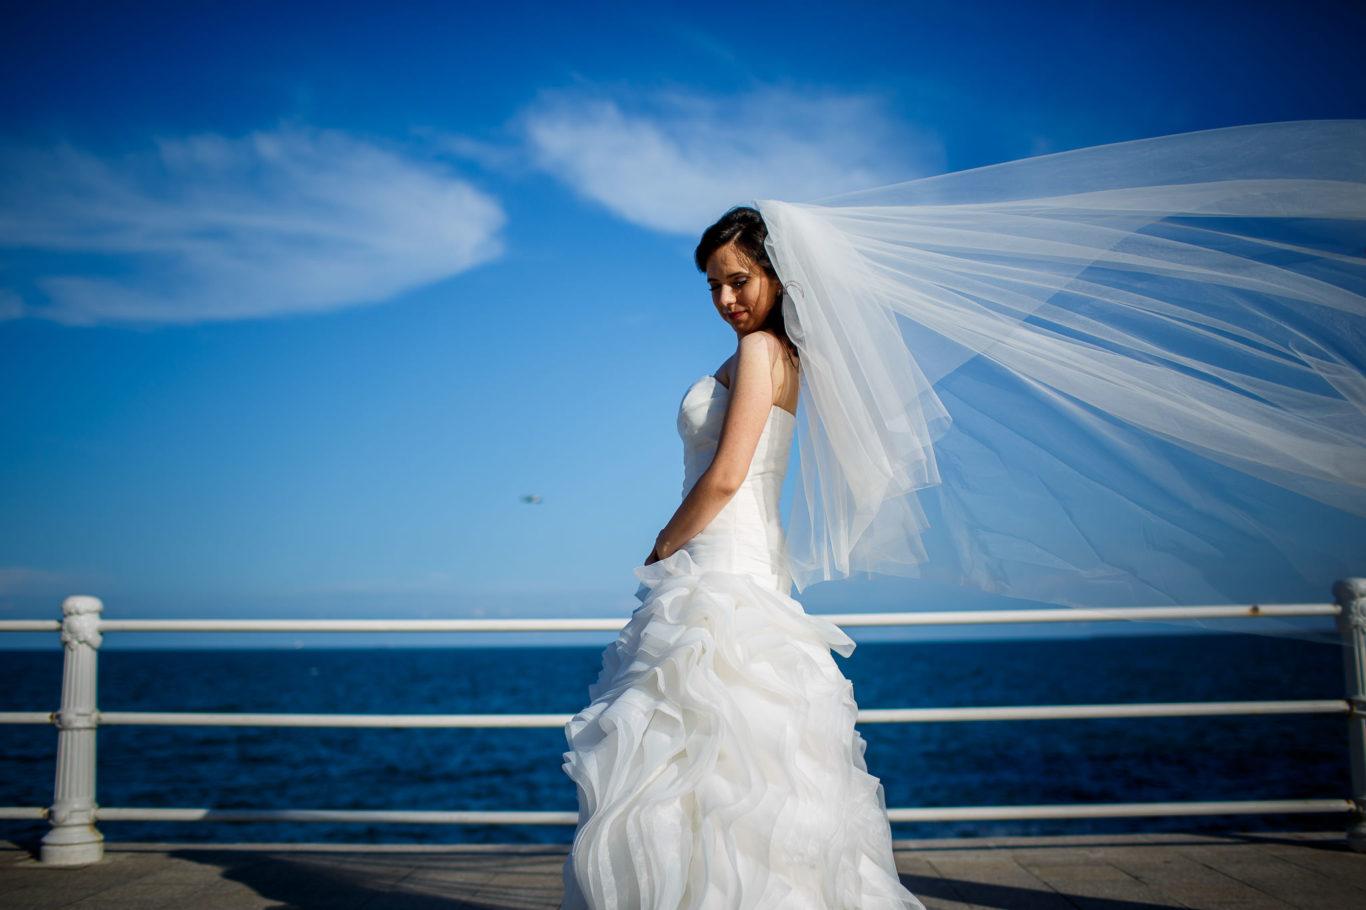 0642-Fotografie-nunta-Simona-Valentin-fotograf-Ciprian-Dumitrescu-CDF_9991